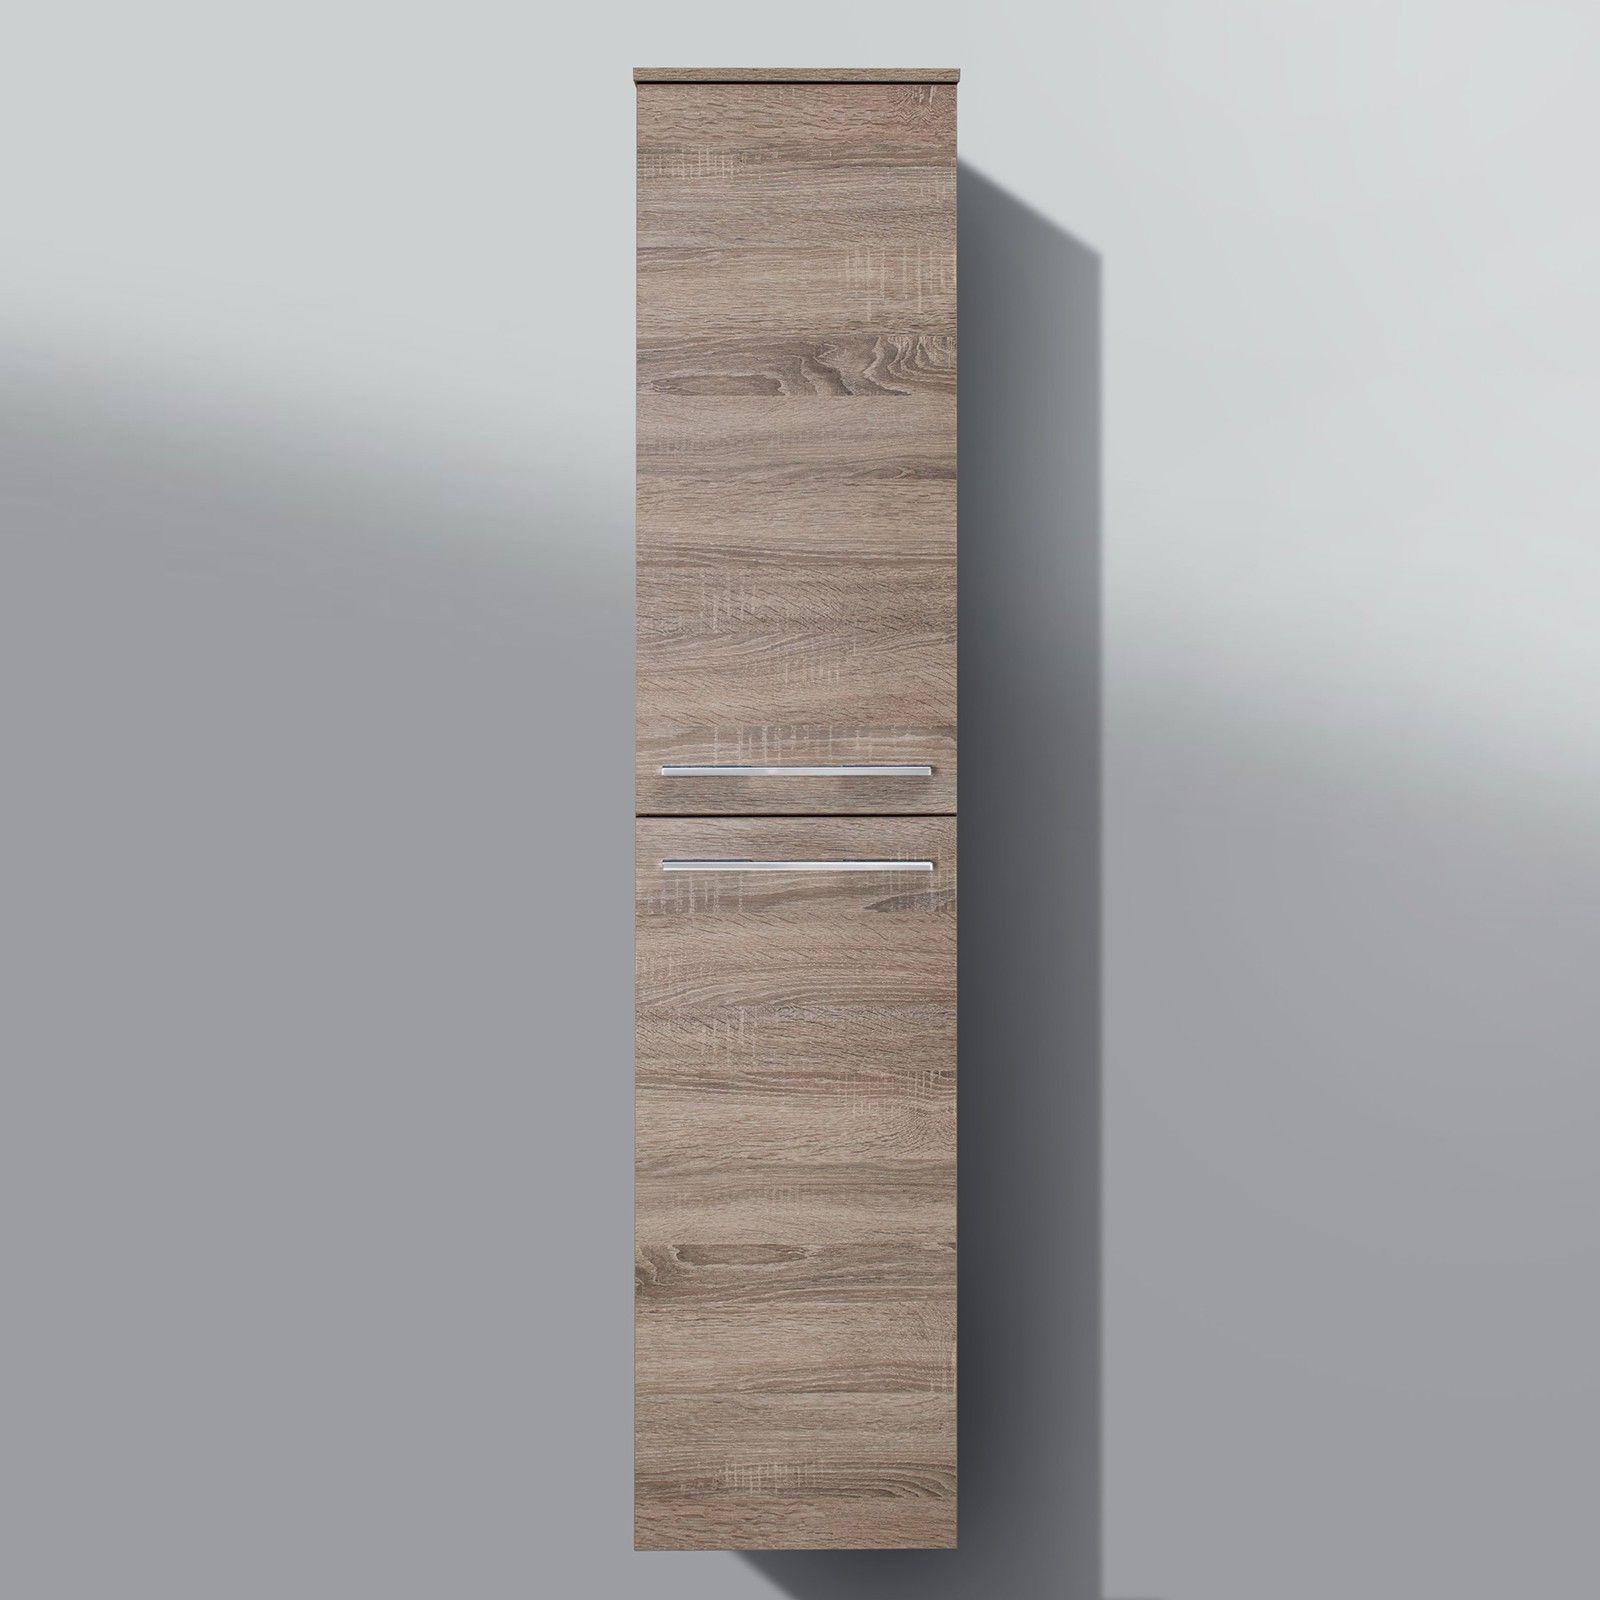 Badmöbel hochschrank  Bad Hochschrank Badmöbel Maße: H/B/T 160/35/33 cm komplett ...